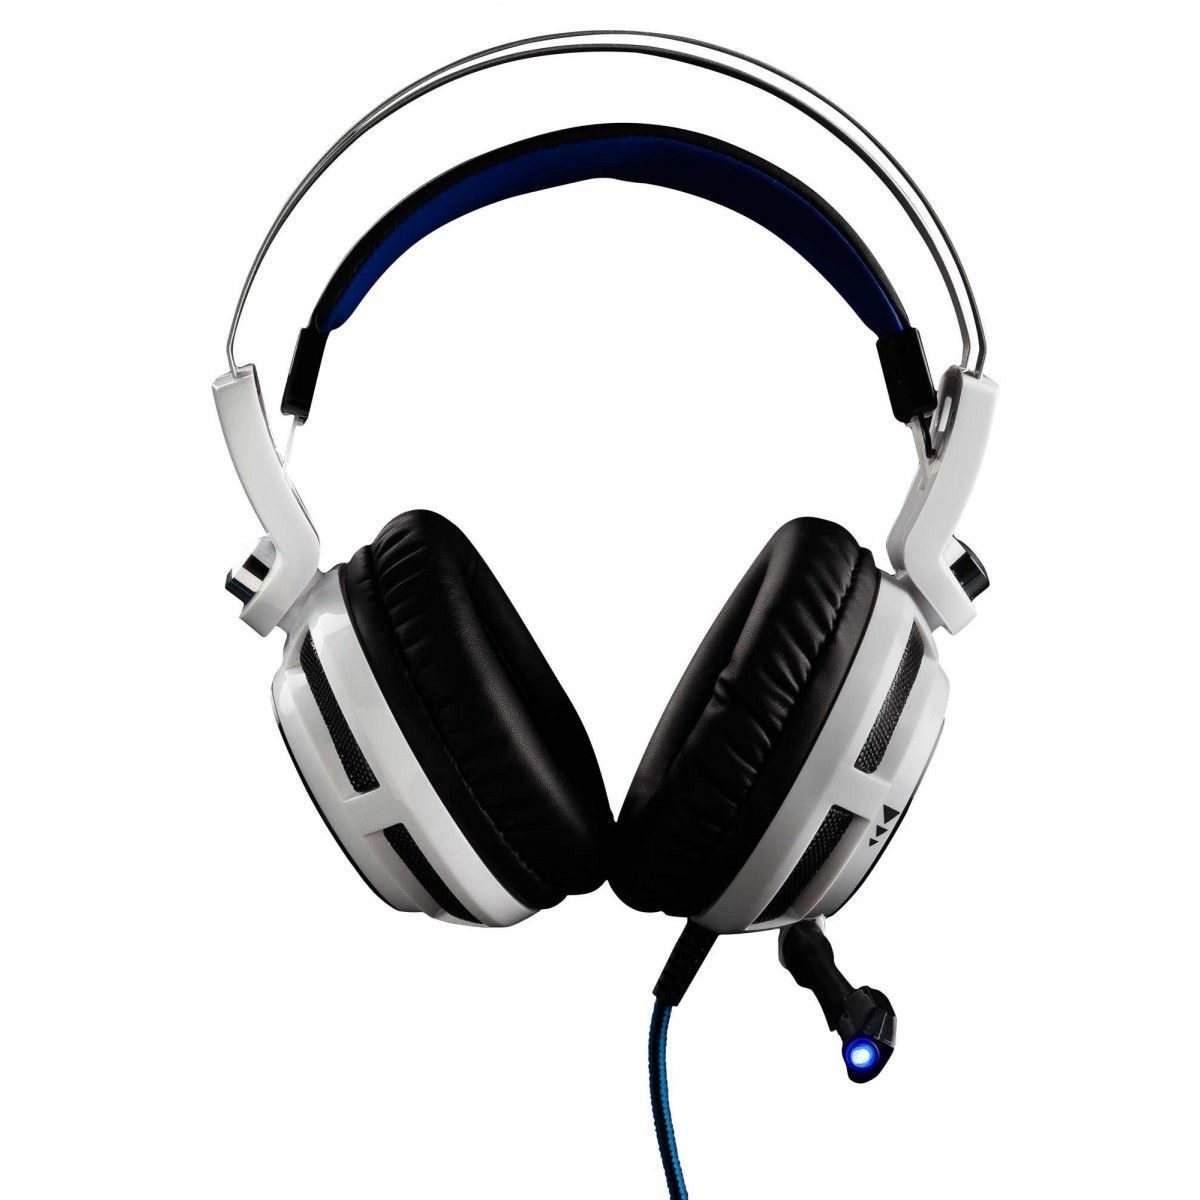 Casque audio THE G LAB KORP 200